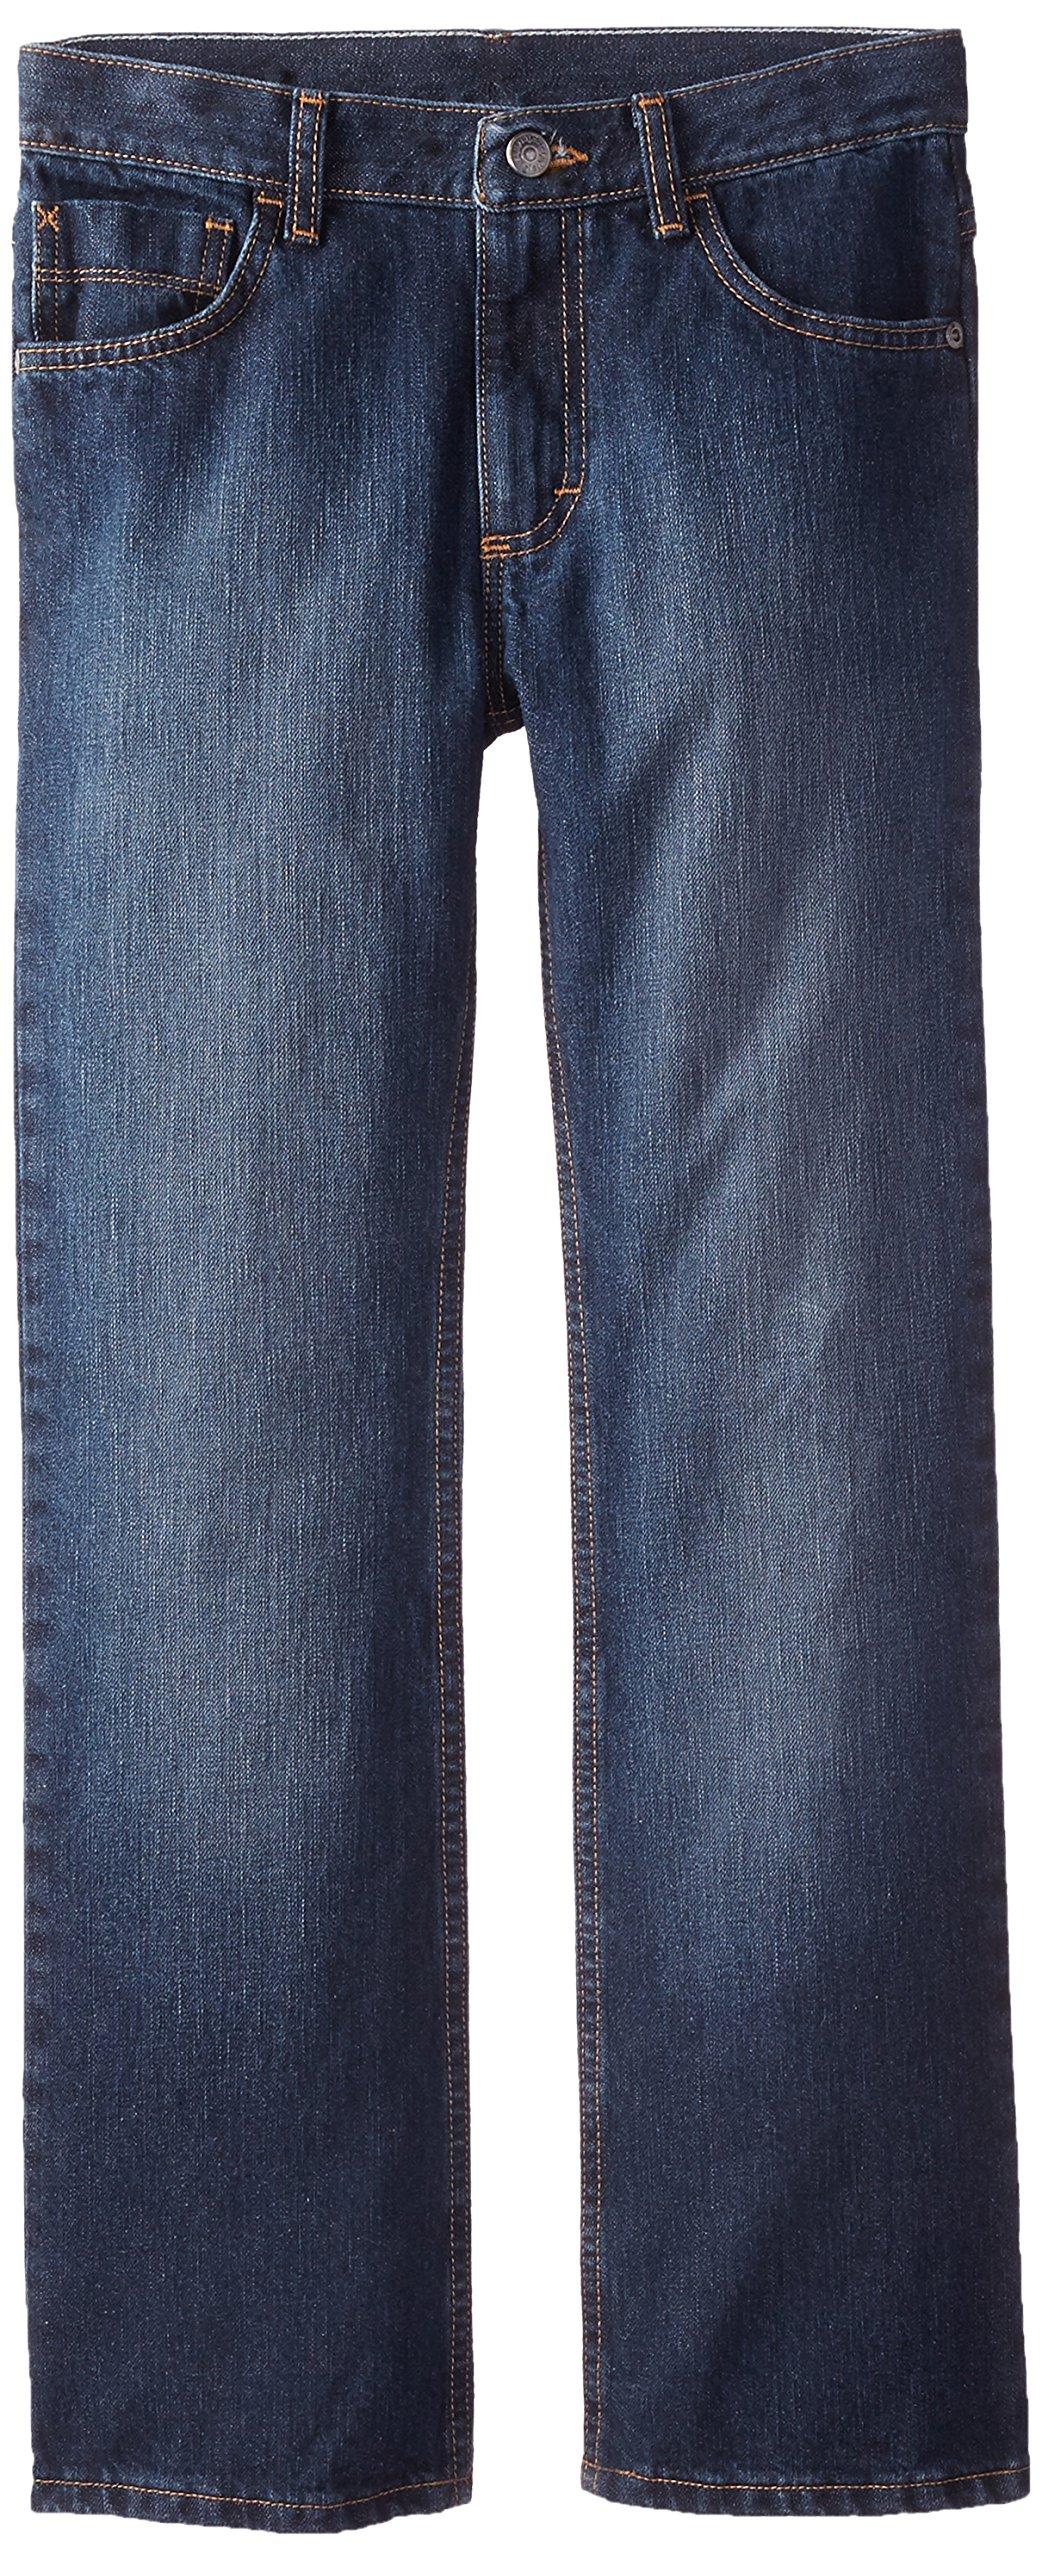 Wrangler Big Boys' Authentics Boot Cut Jeans, Fresh Indigo, 10